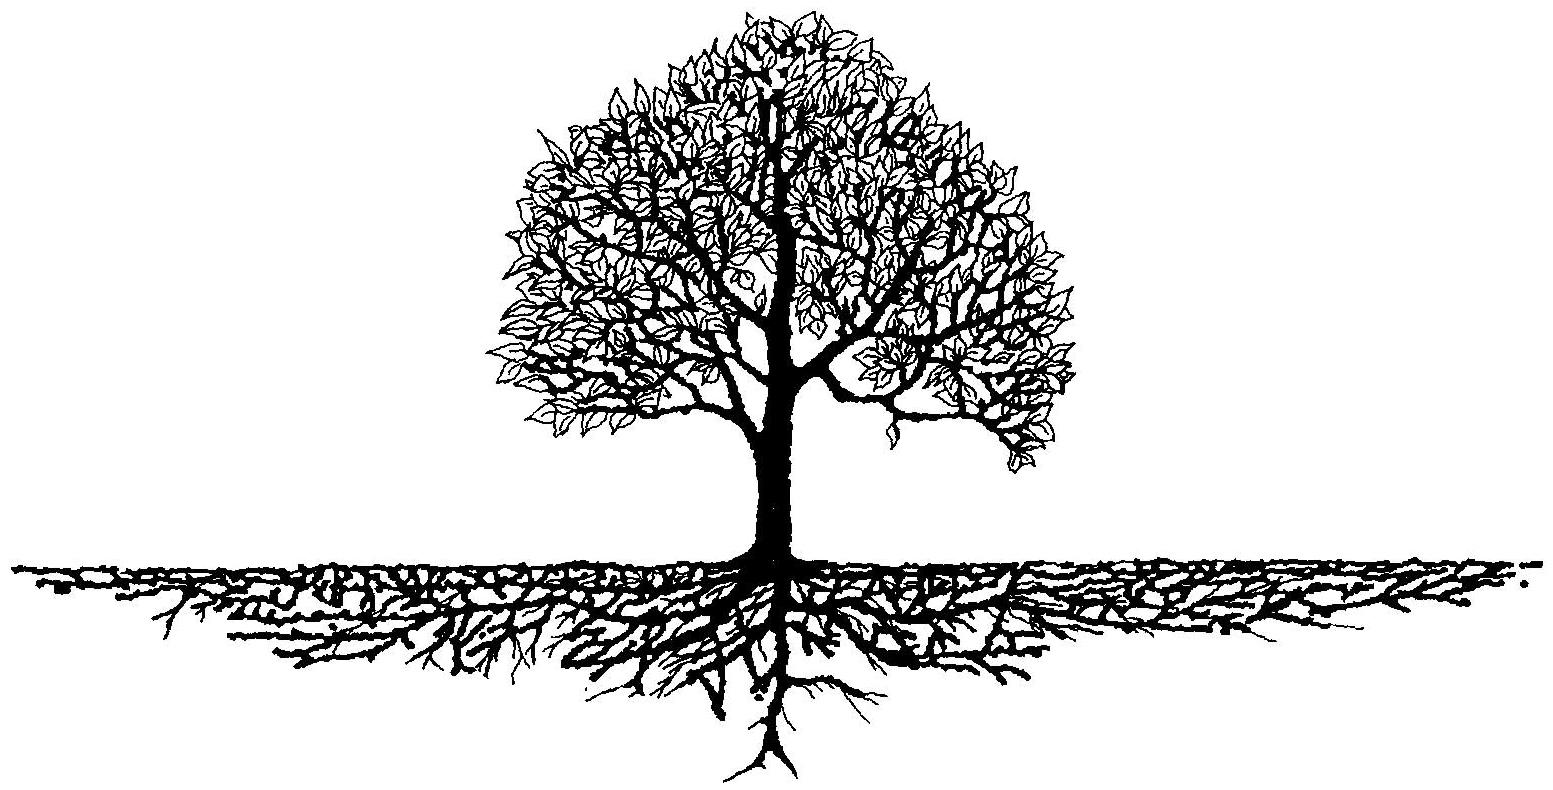 Your Tartan's Roots Run Deep